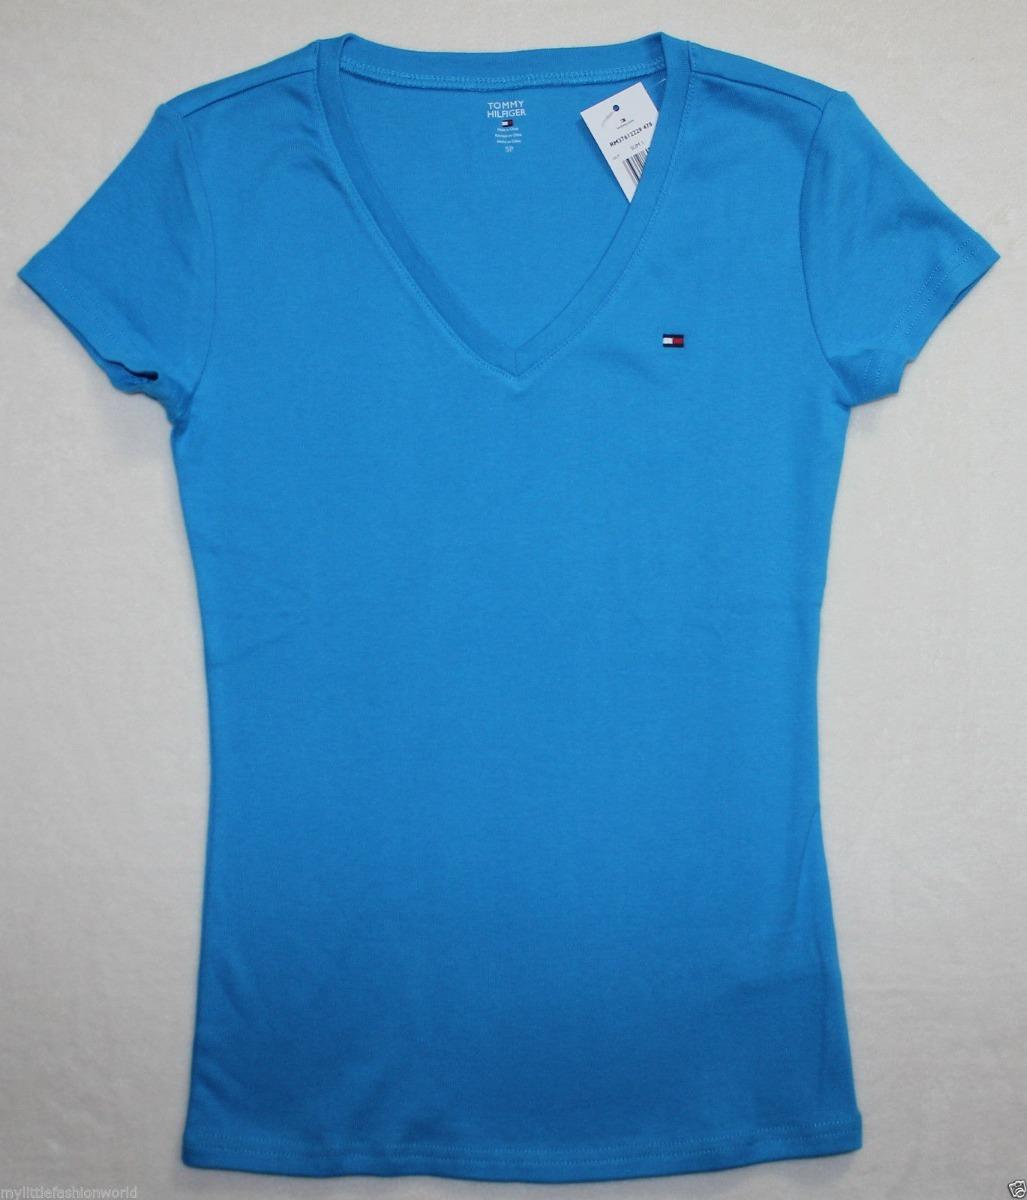 48befaeb3d blusa básica tommy hilfiger tamanho ggg xxl feminina nova. Carregando zoom.